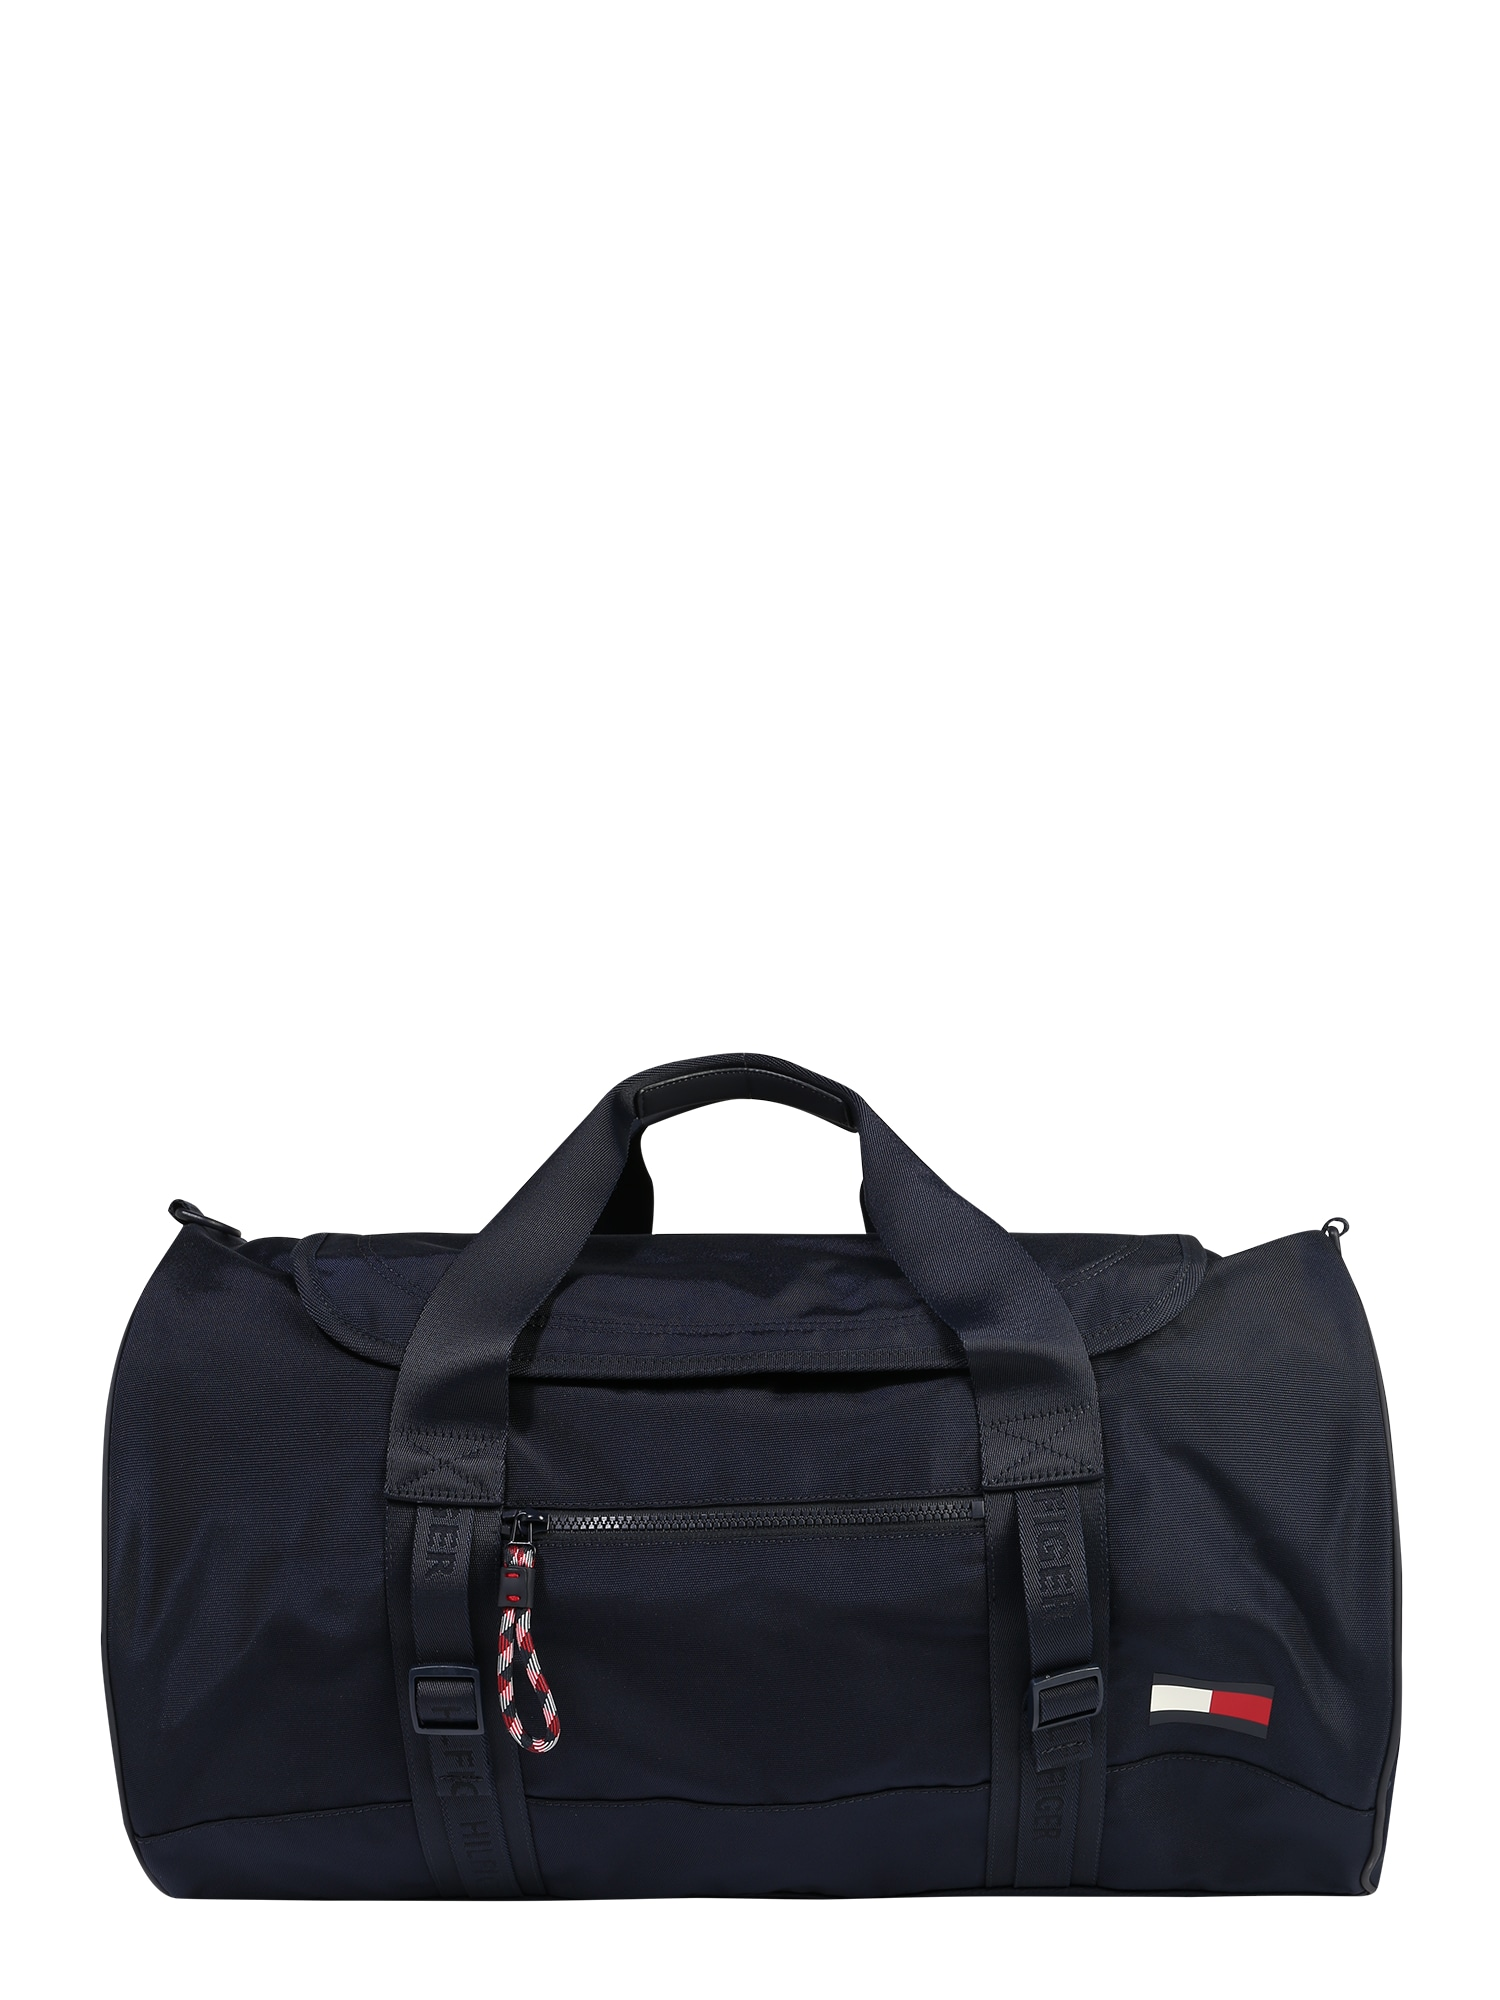 TOMMY HILFIGER Savaitgalio krepšys balta / raudona / tamsiai mėlyna